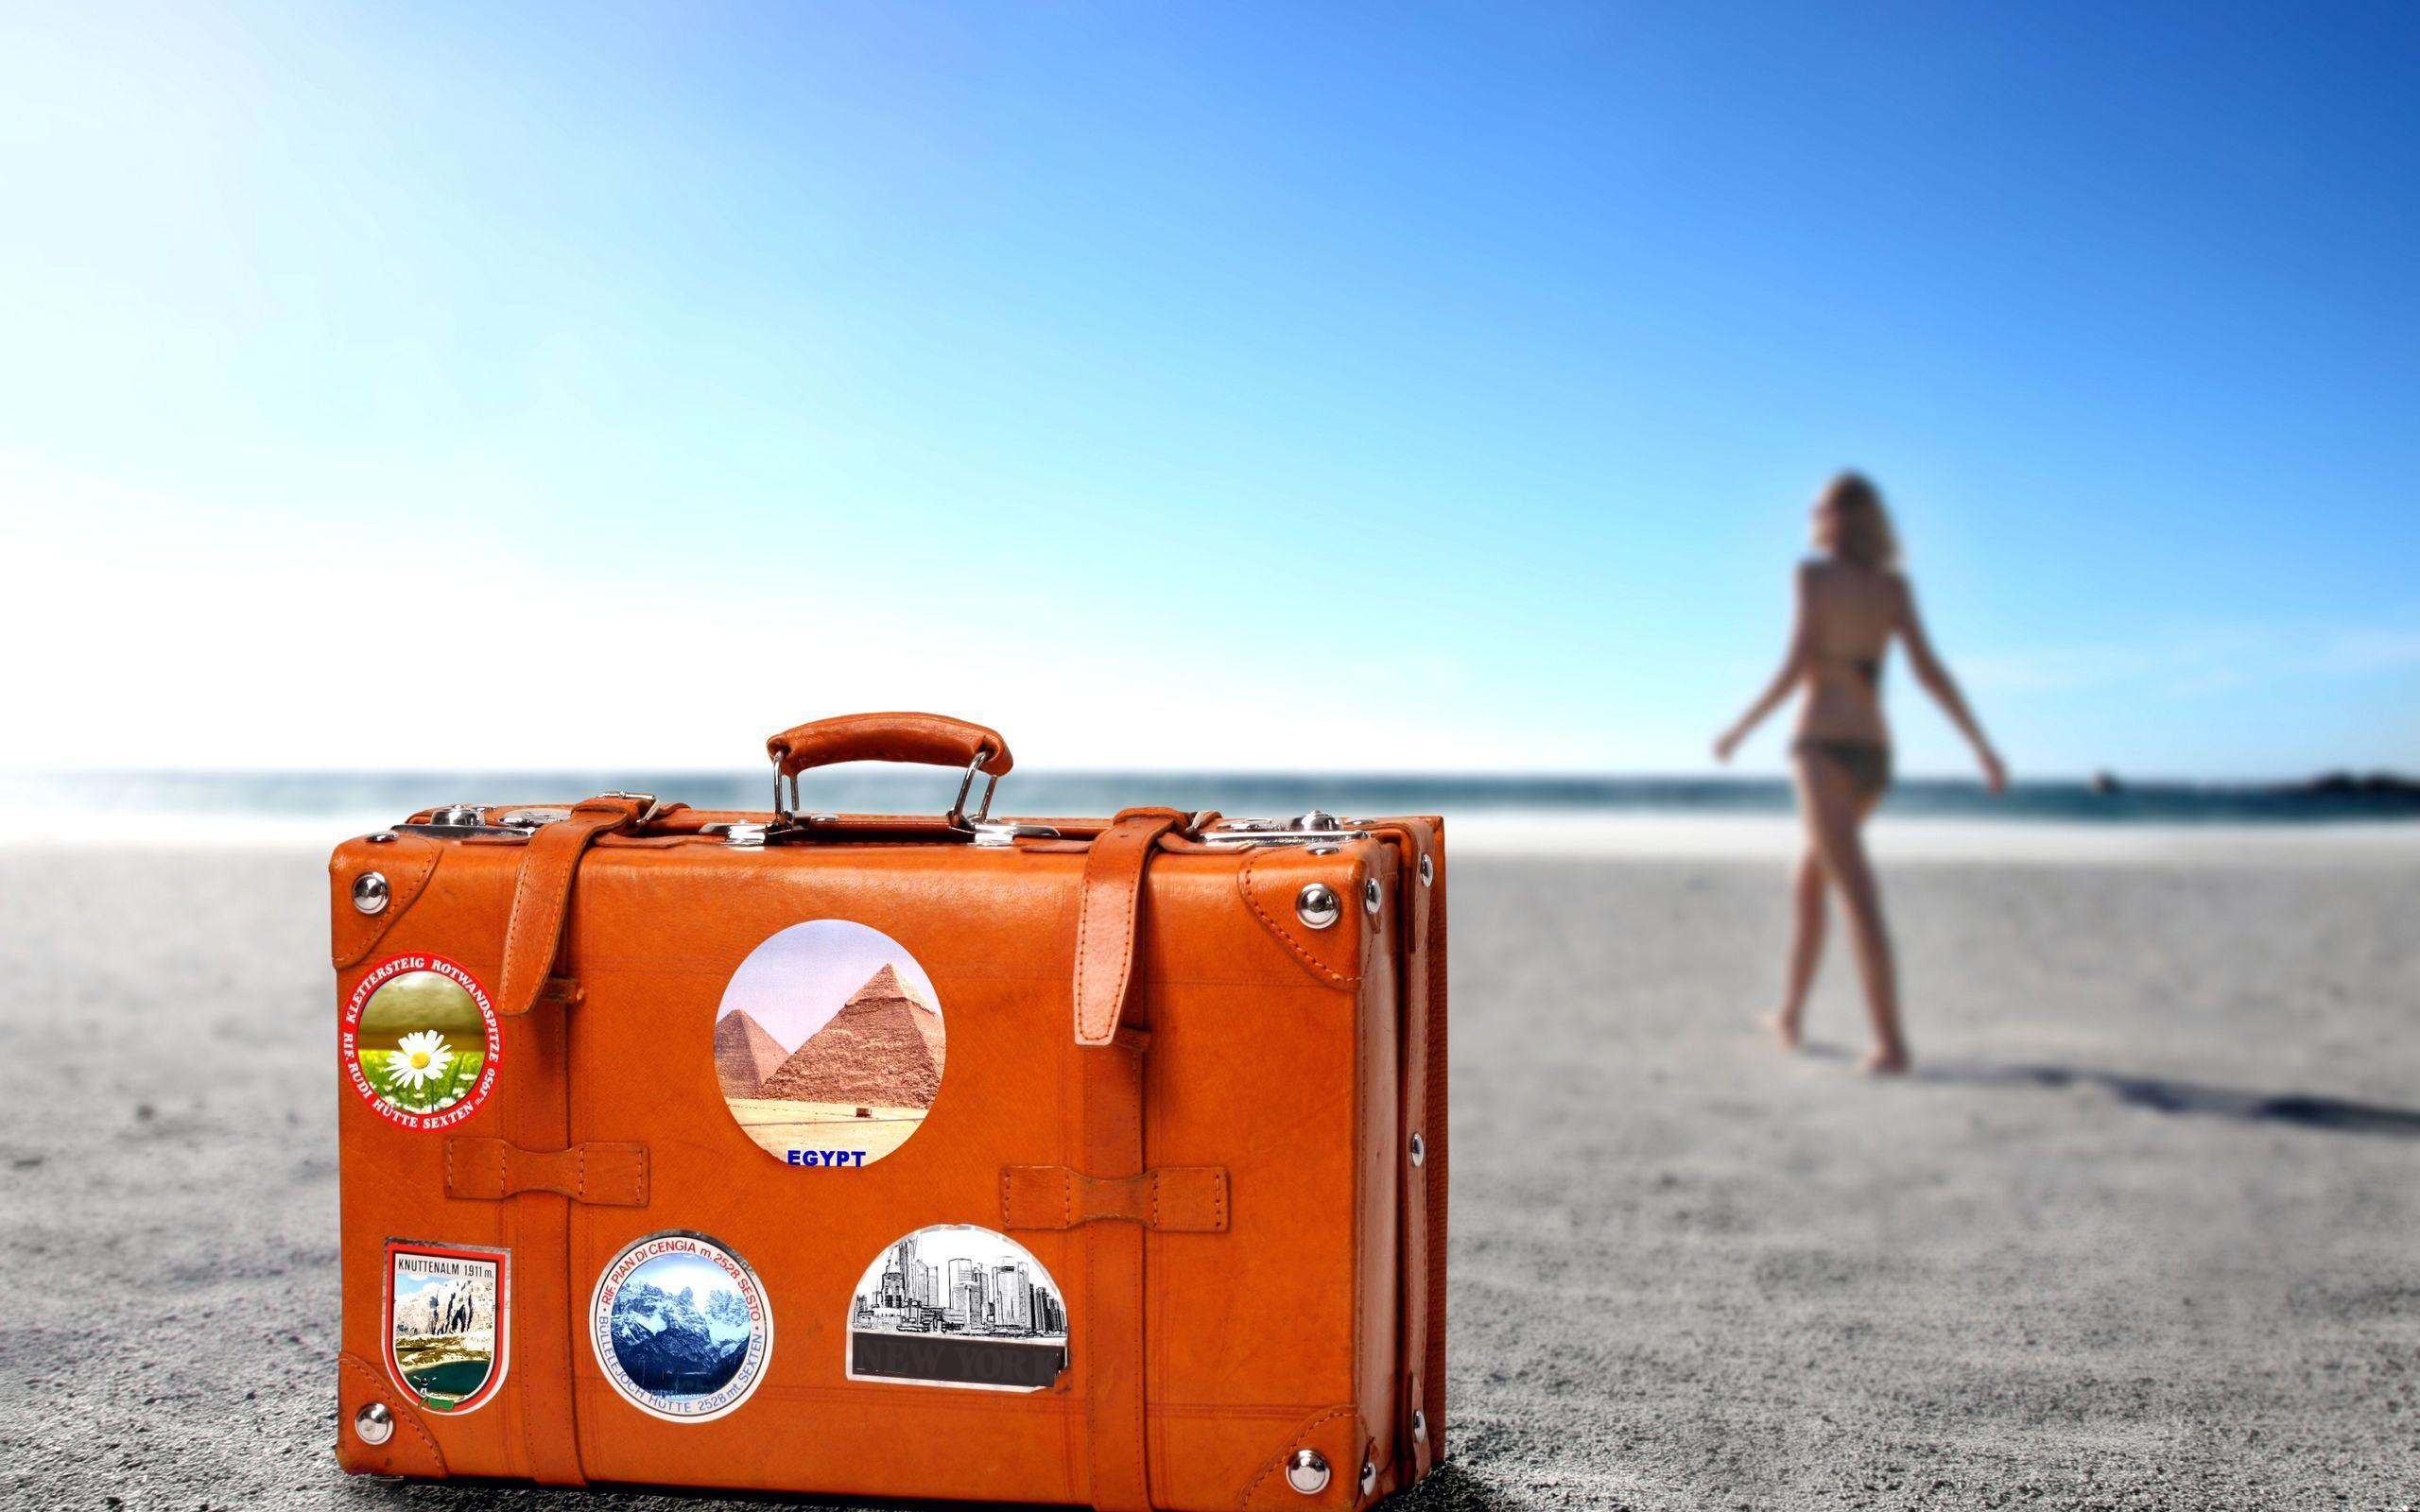 Goedkope reisverzekering online